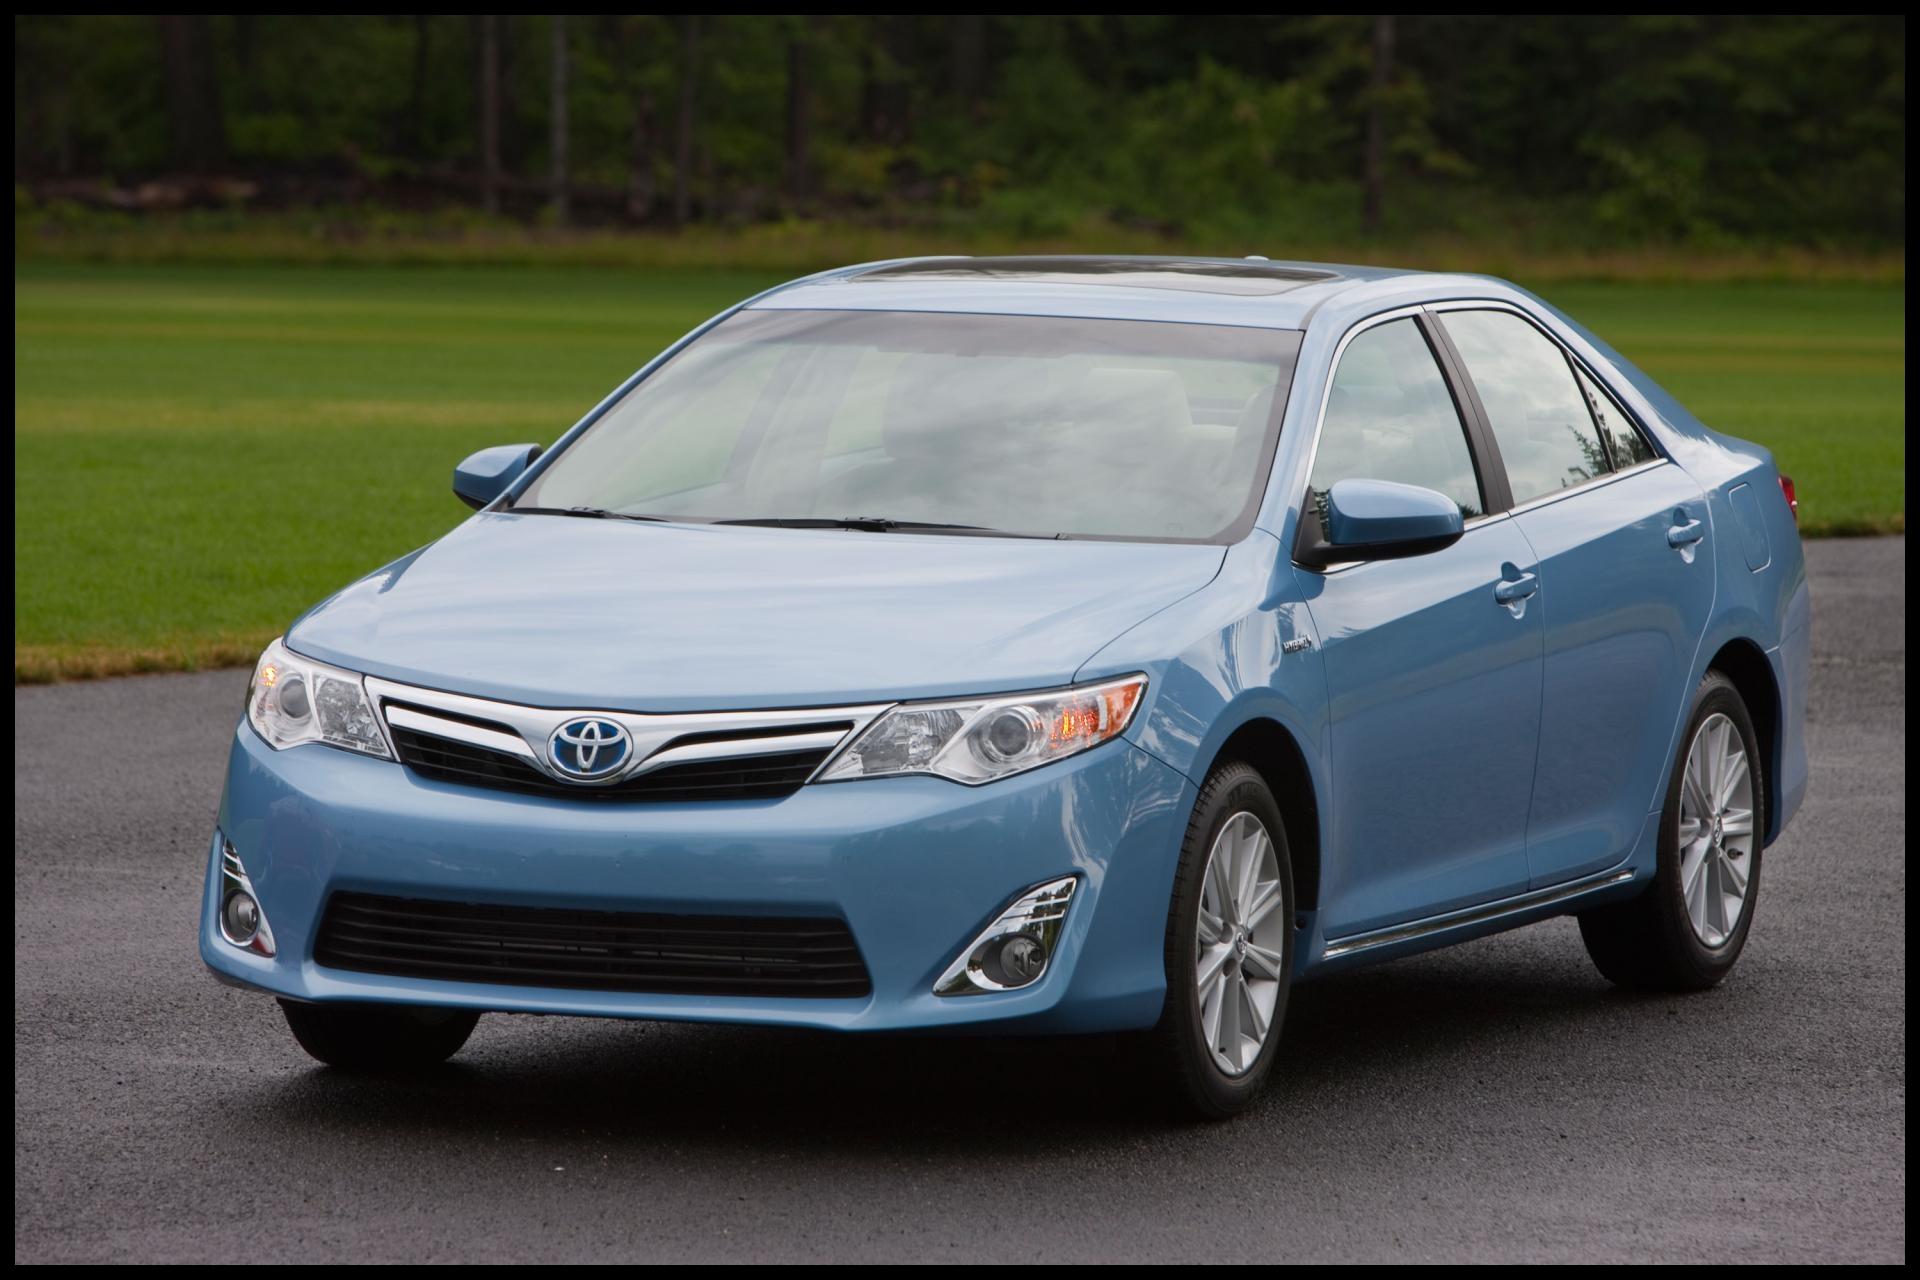 2013 Toyota Camry Sedan Image 01